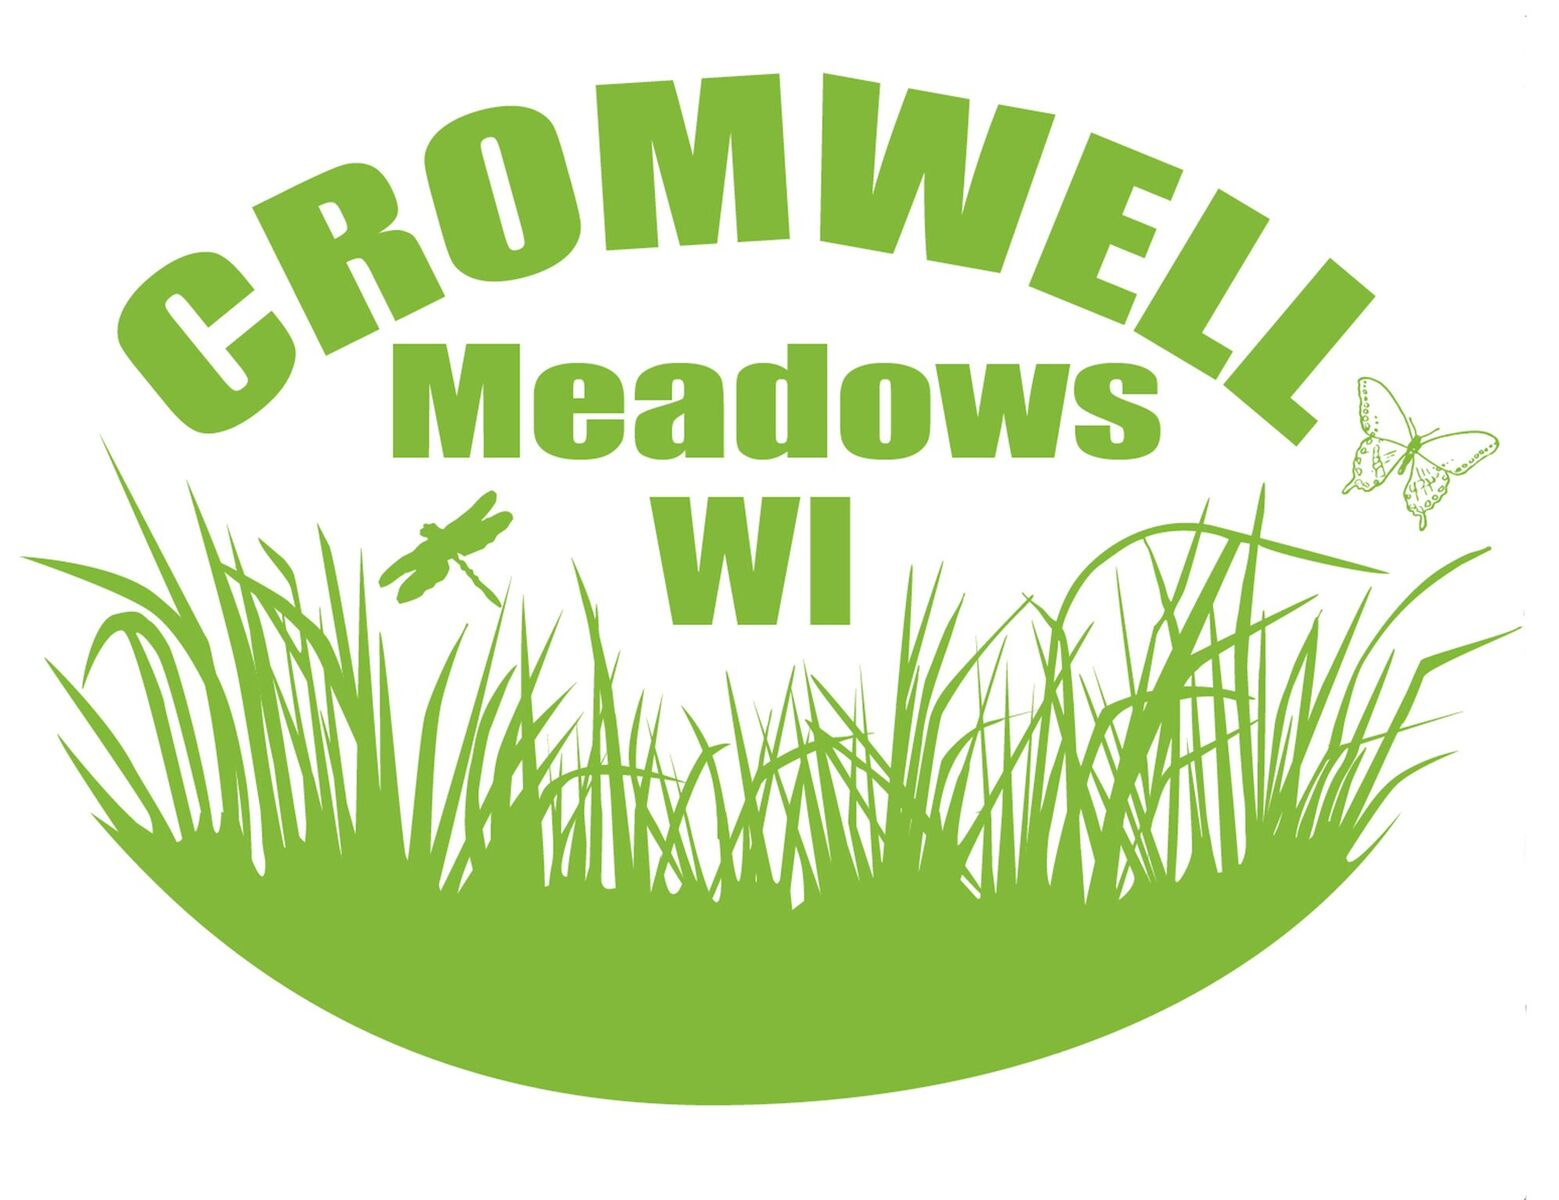 Cromwell Meadows WI logo